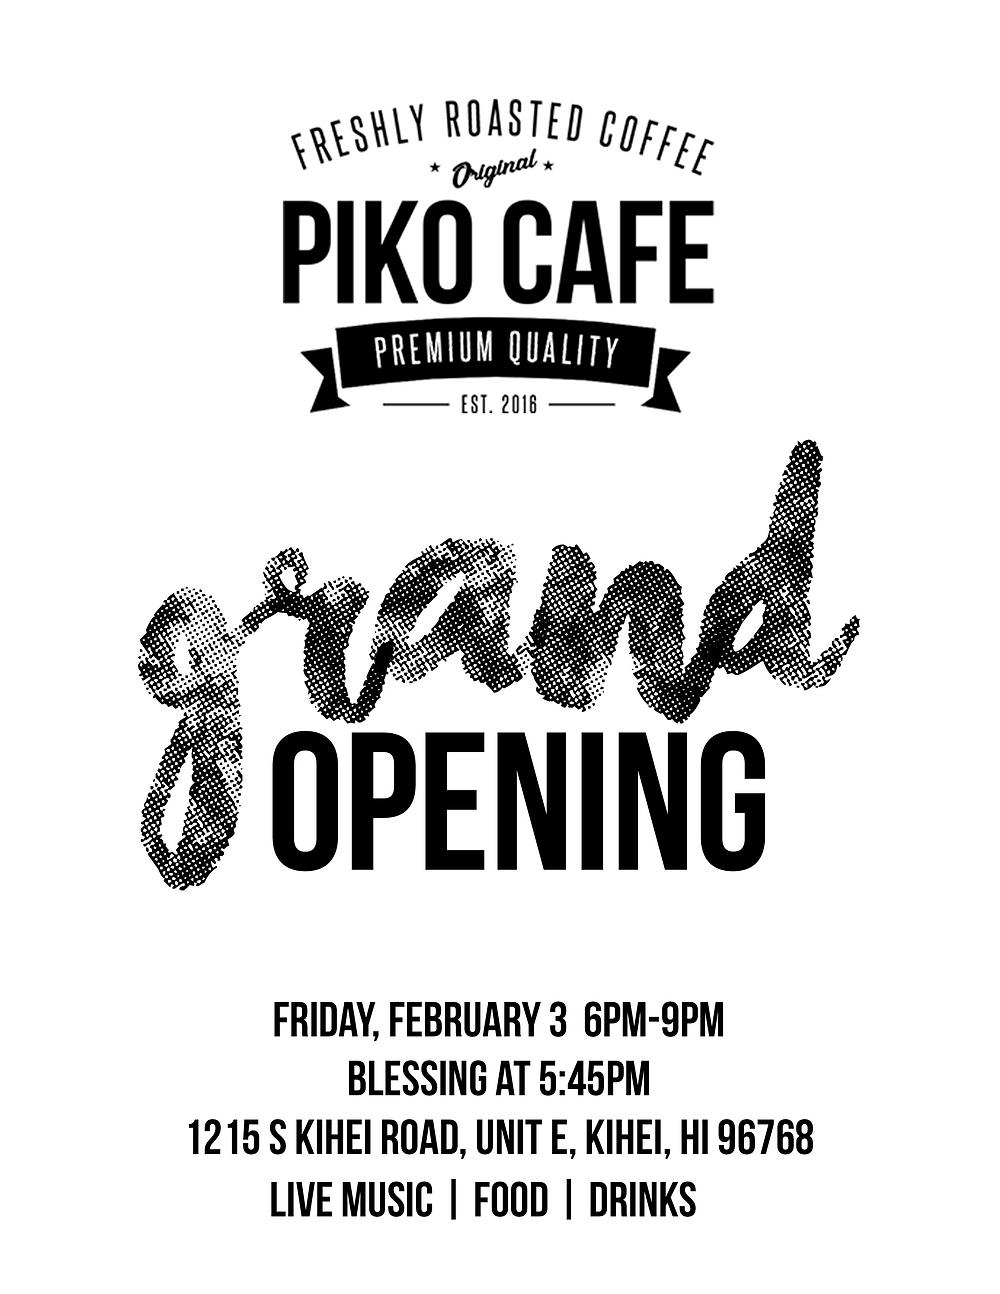 Piko Cafe Grand Opening Island Style Food Maui Kihei